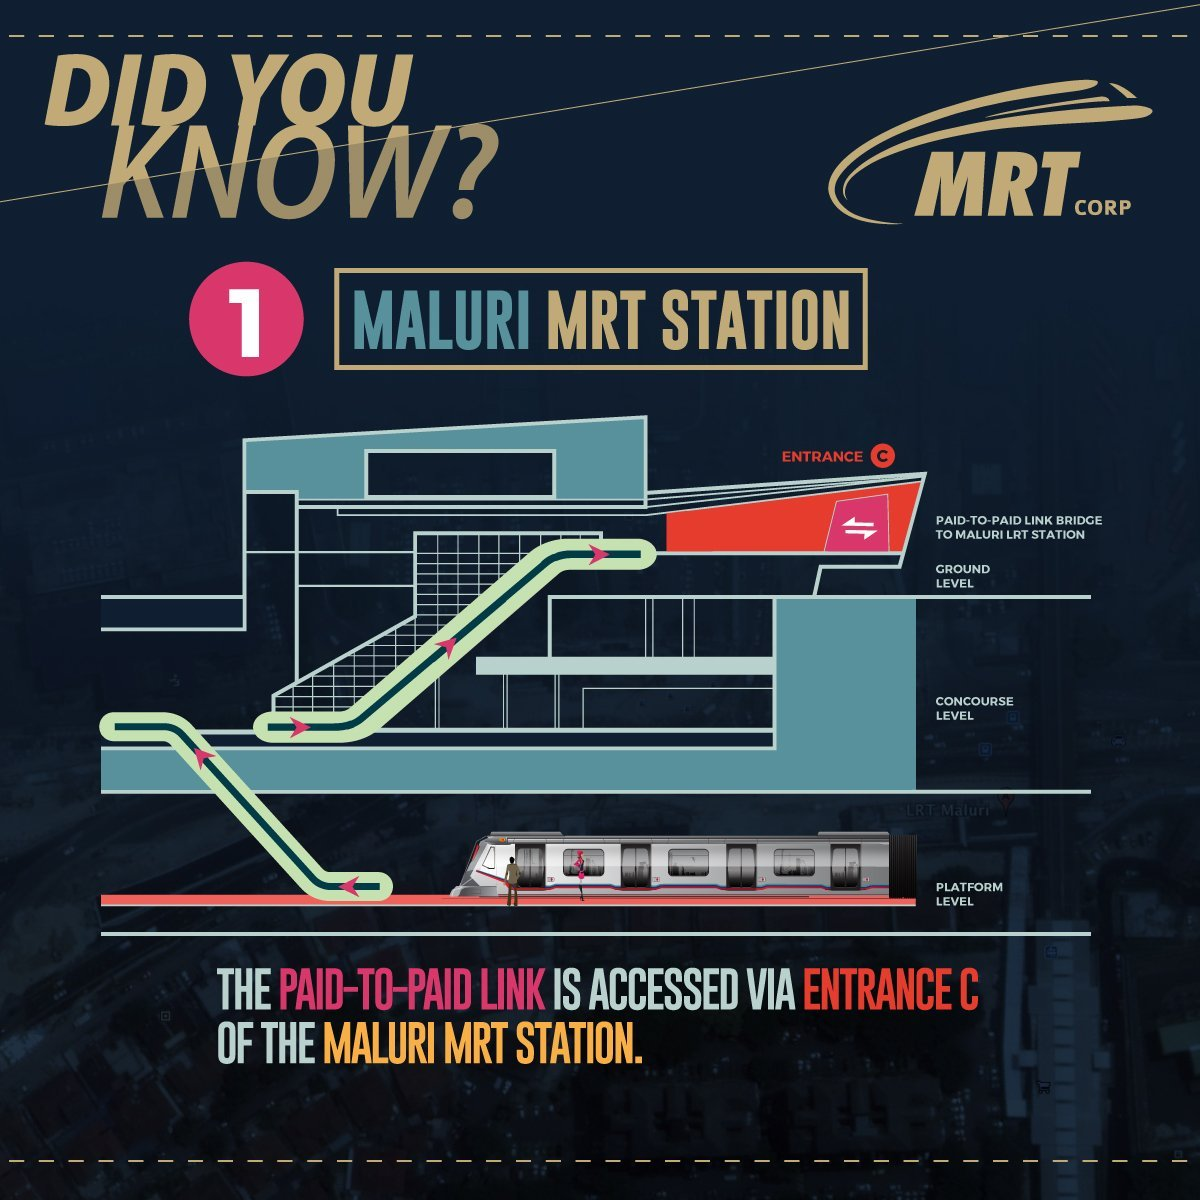 Maluri LRT Station – klia2 info